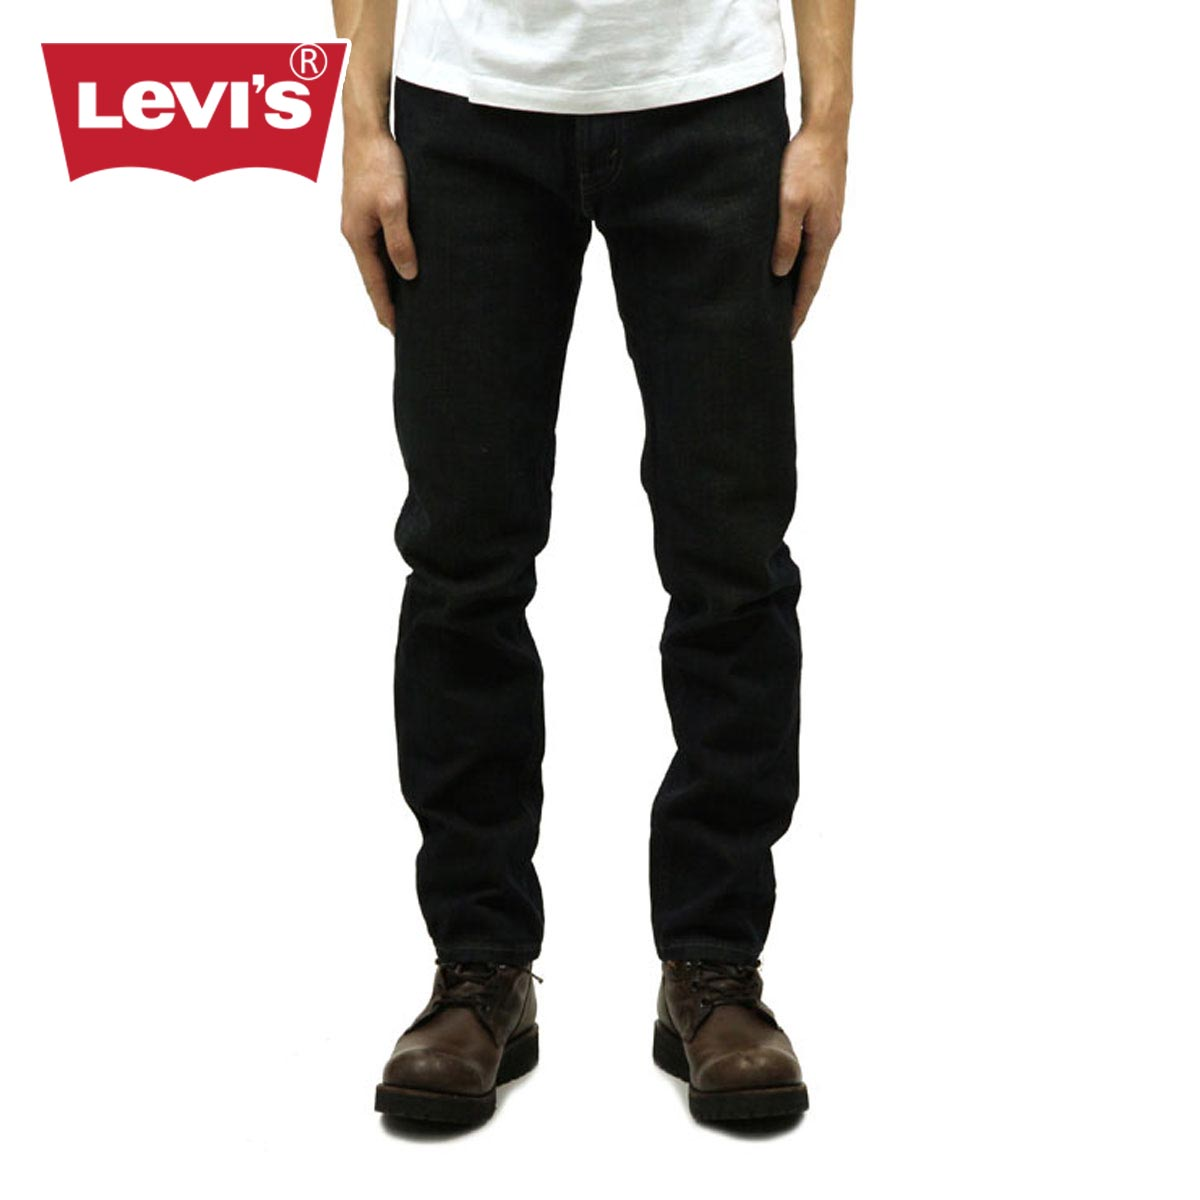 Levi's 511 skinny jeans clean dark